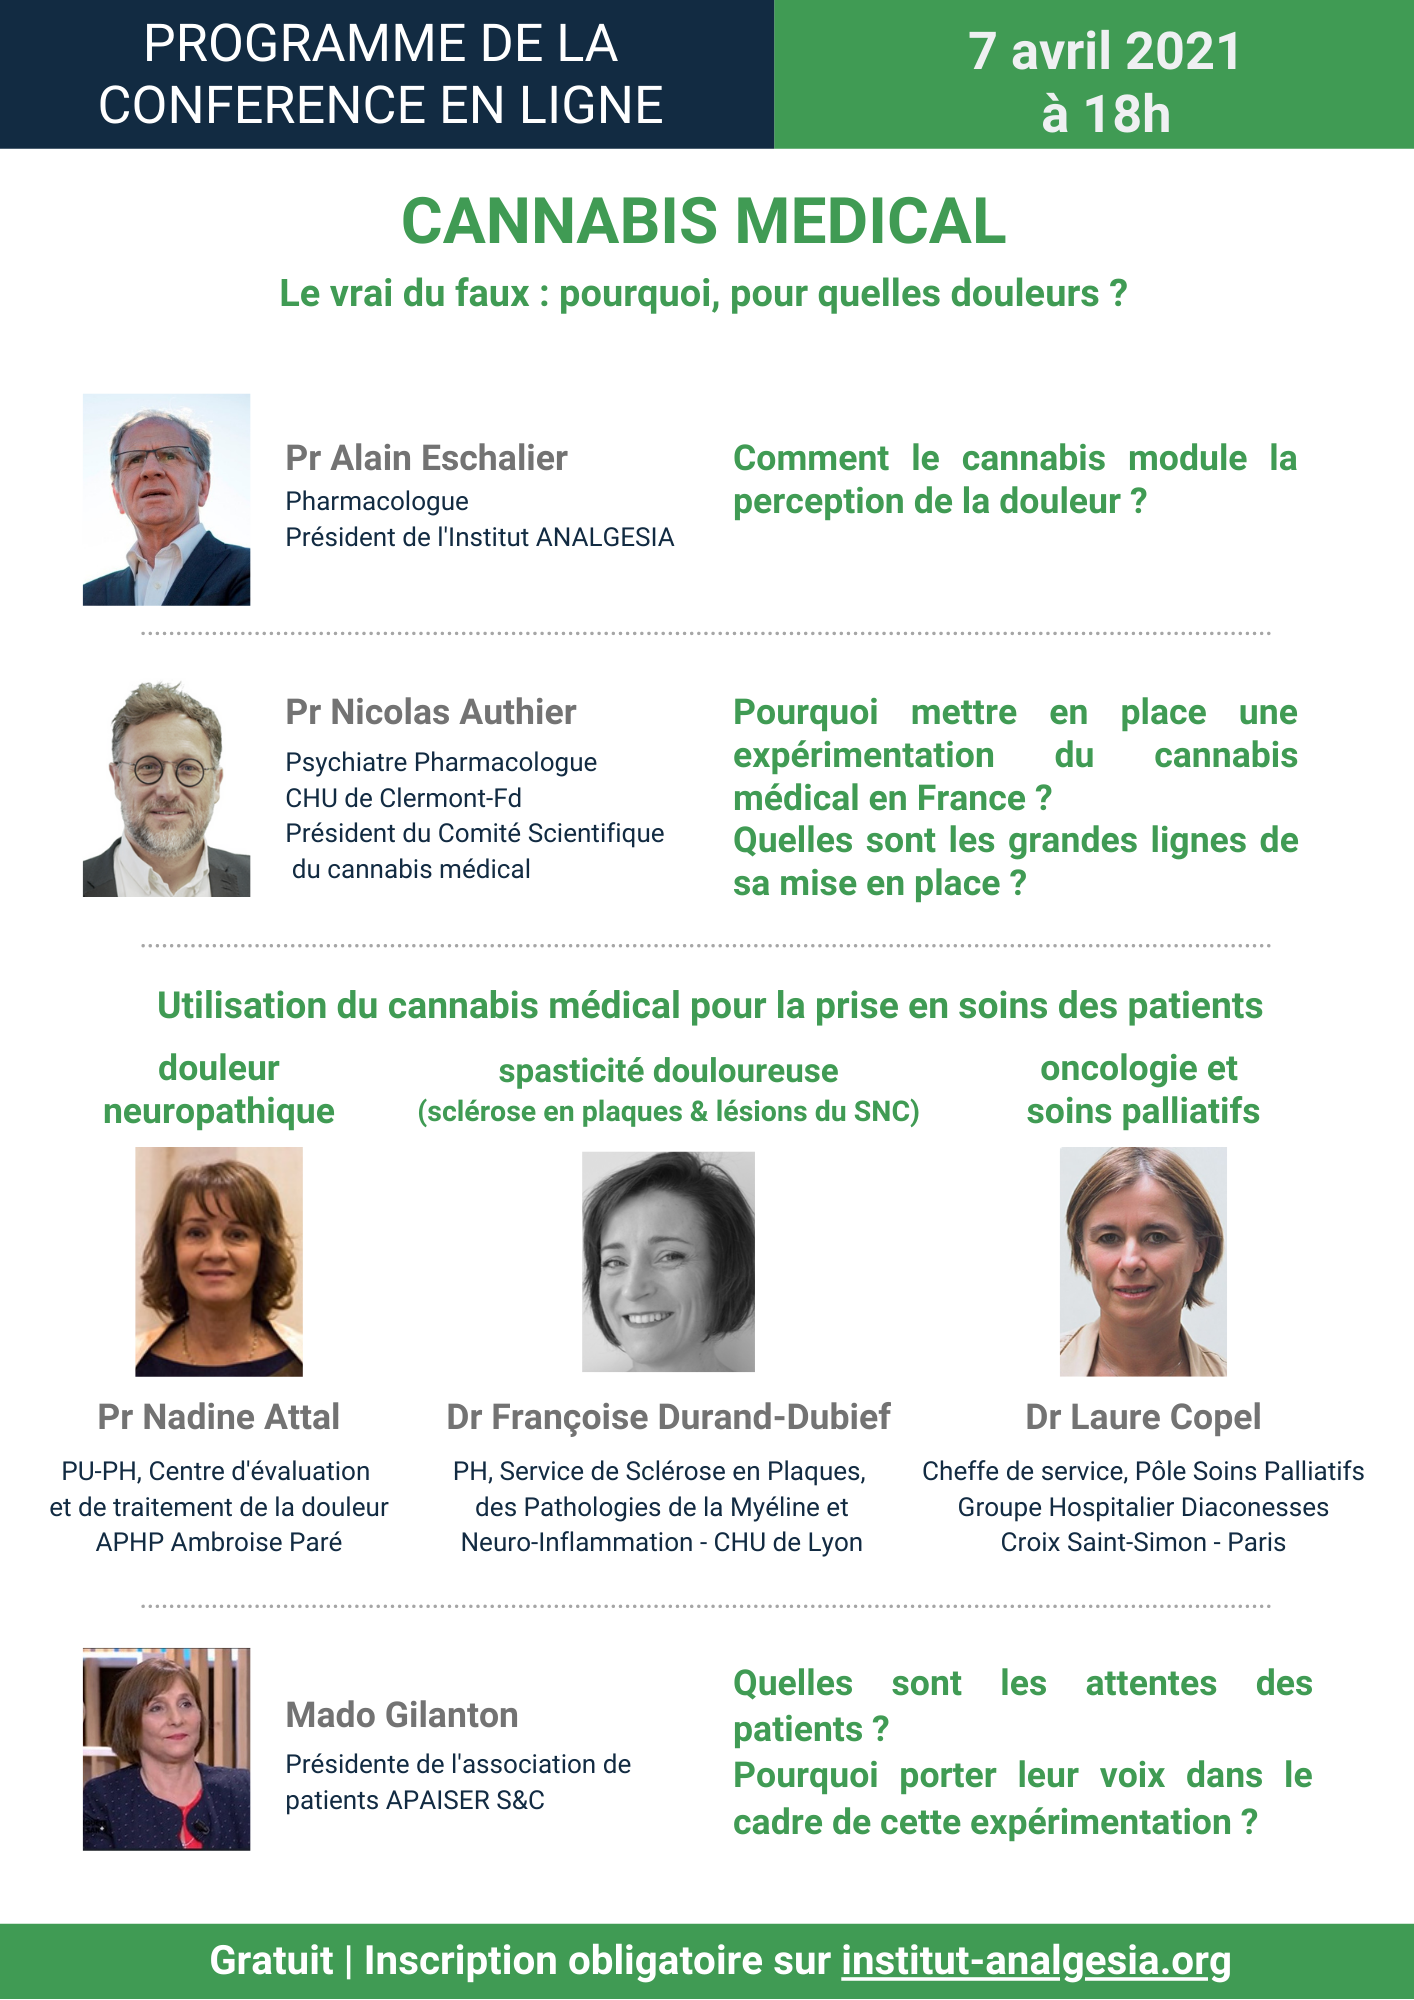 Programme CANNABIS MÉDICAL, LE VRAI DU FAUX, Analgesia, 7 avril 2021